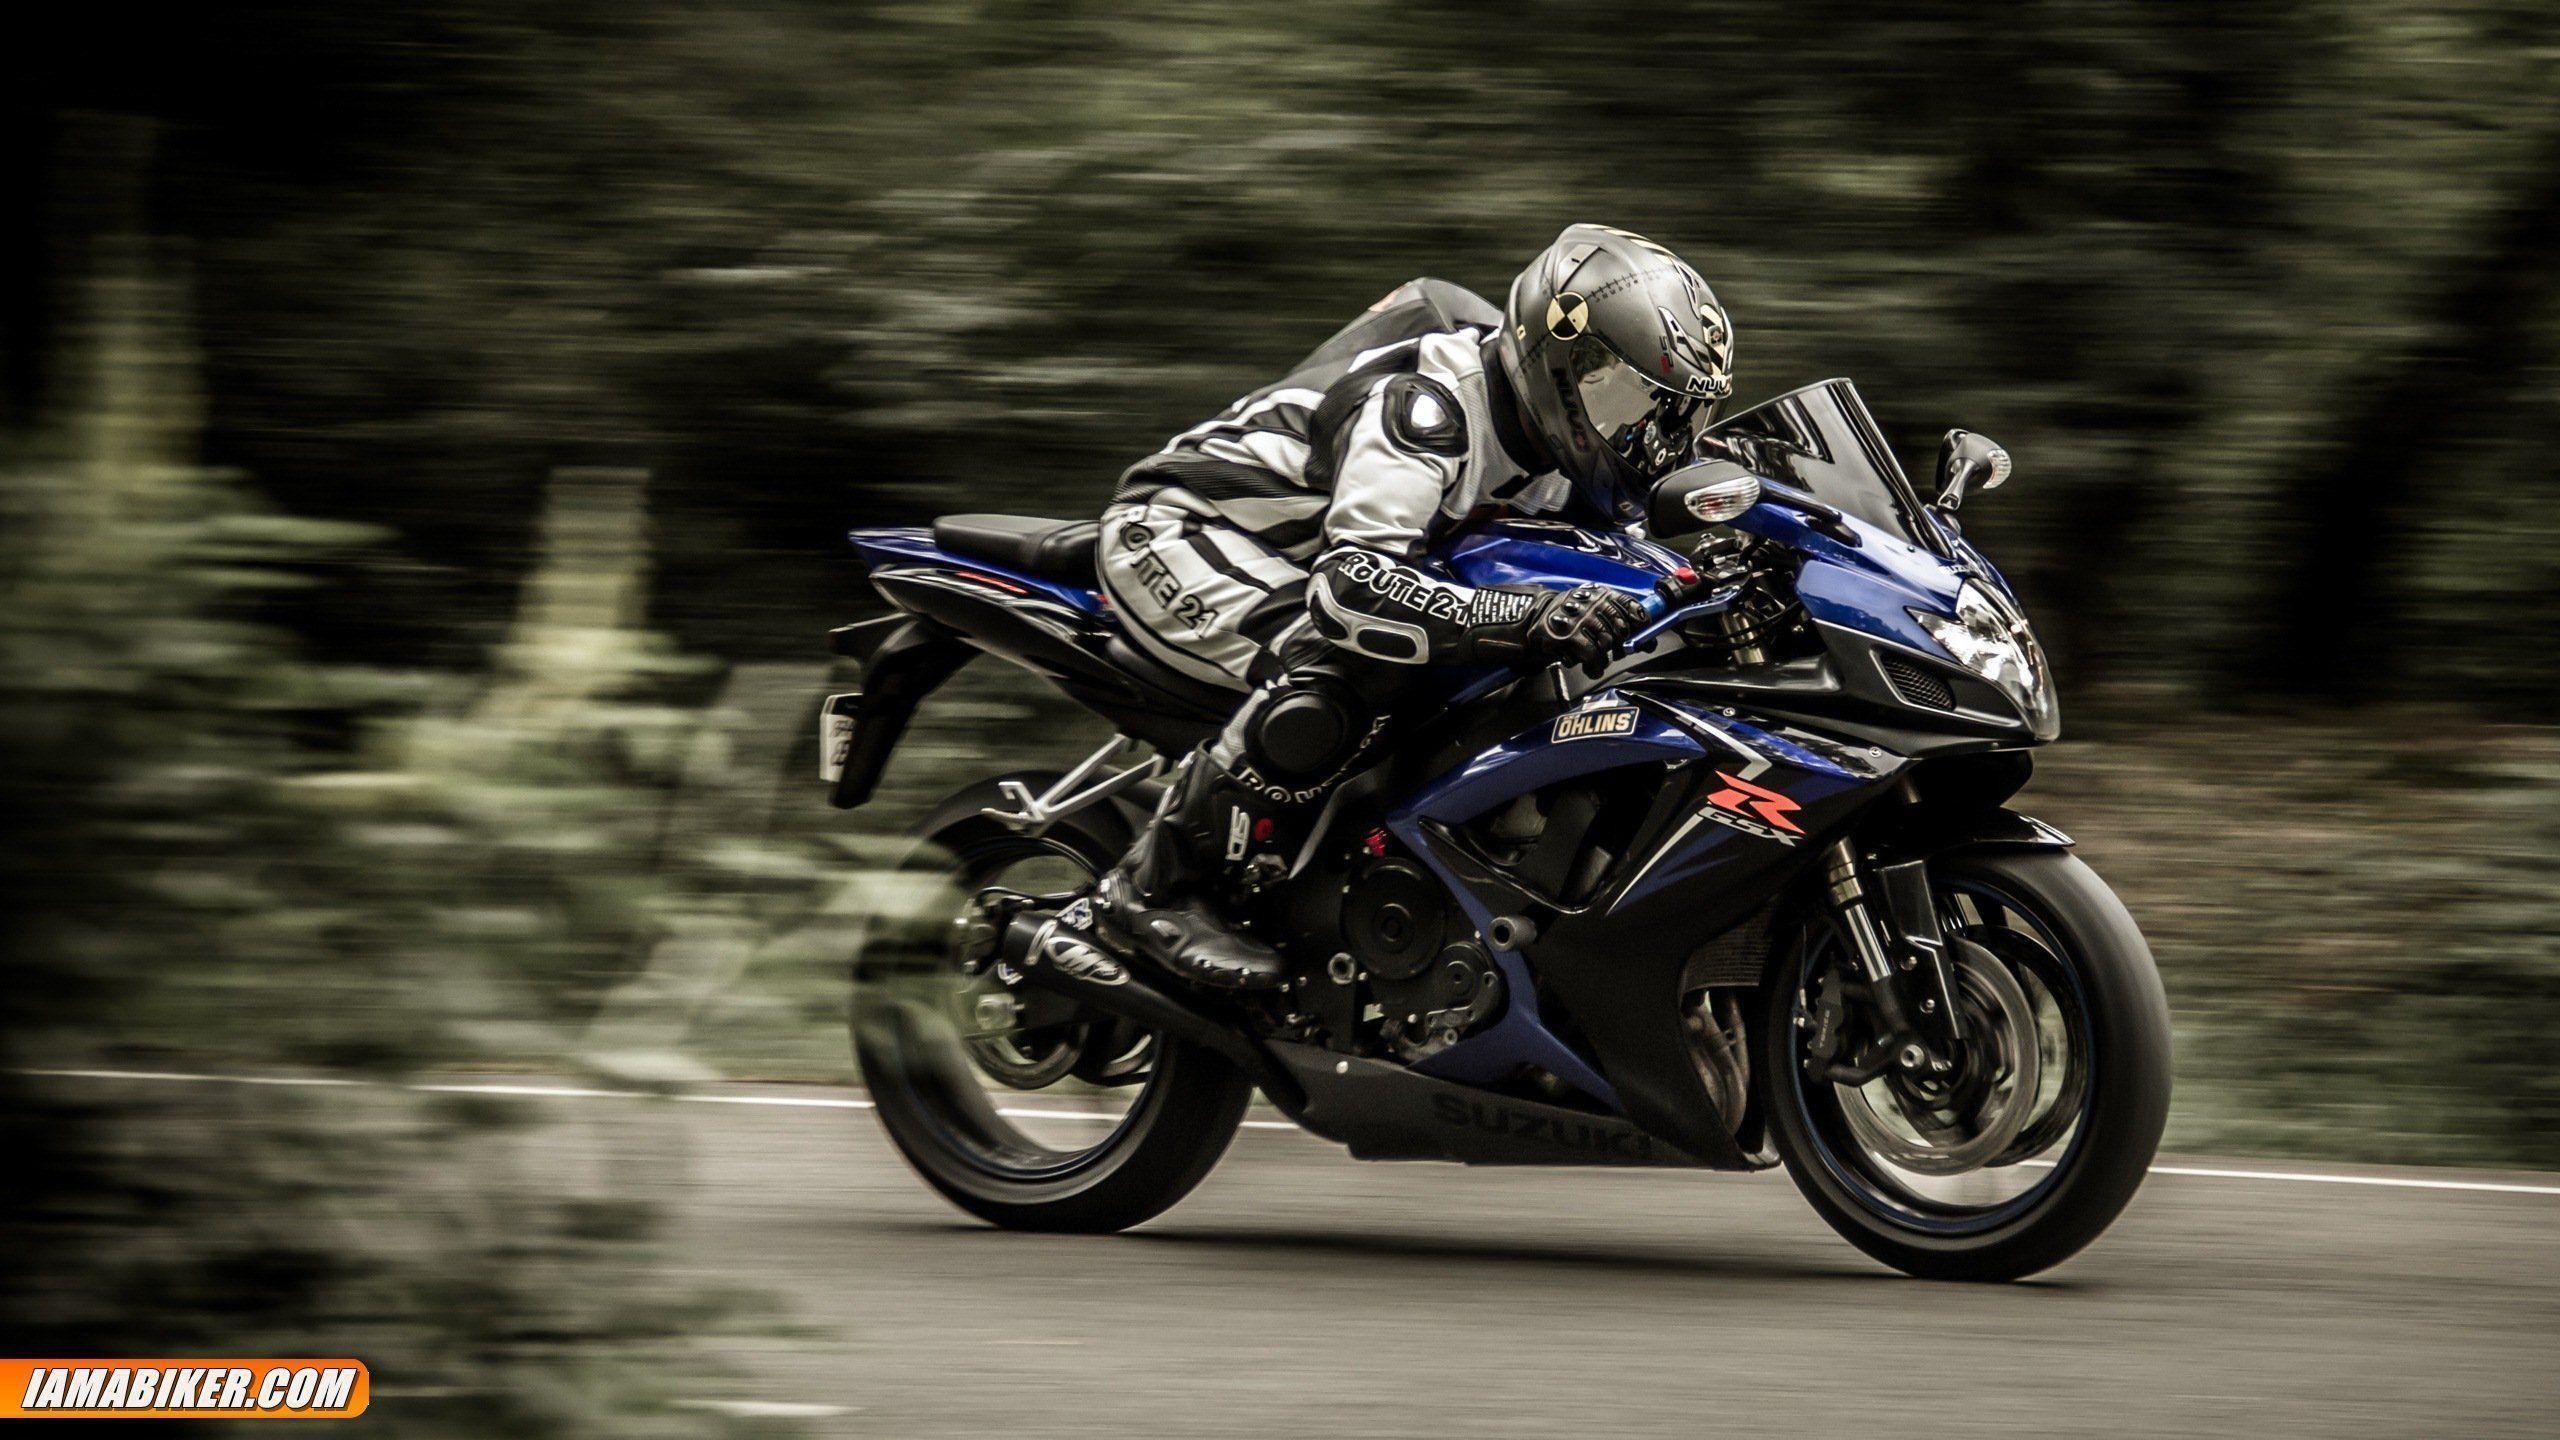 борьба картинки на телефон обои мотоциклы сузуки роль